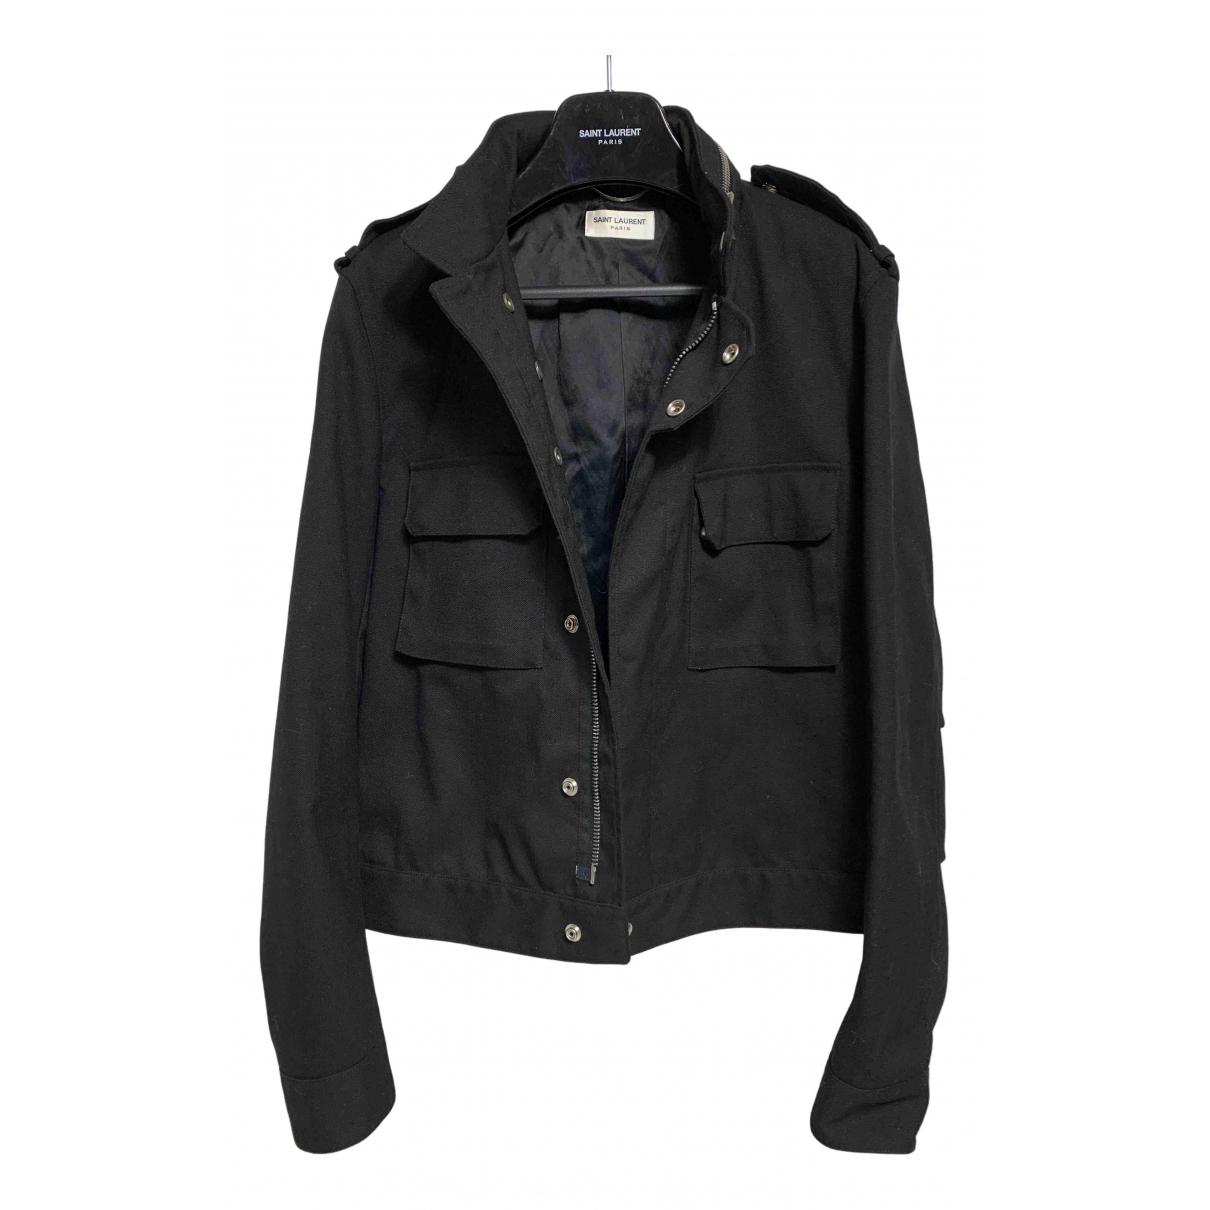 Saint Laurent N Black Cotton jacket  for Men M International